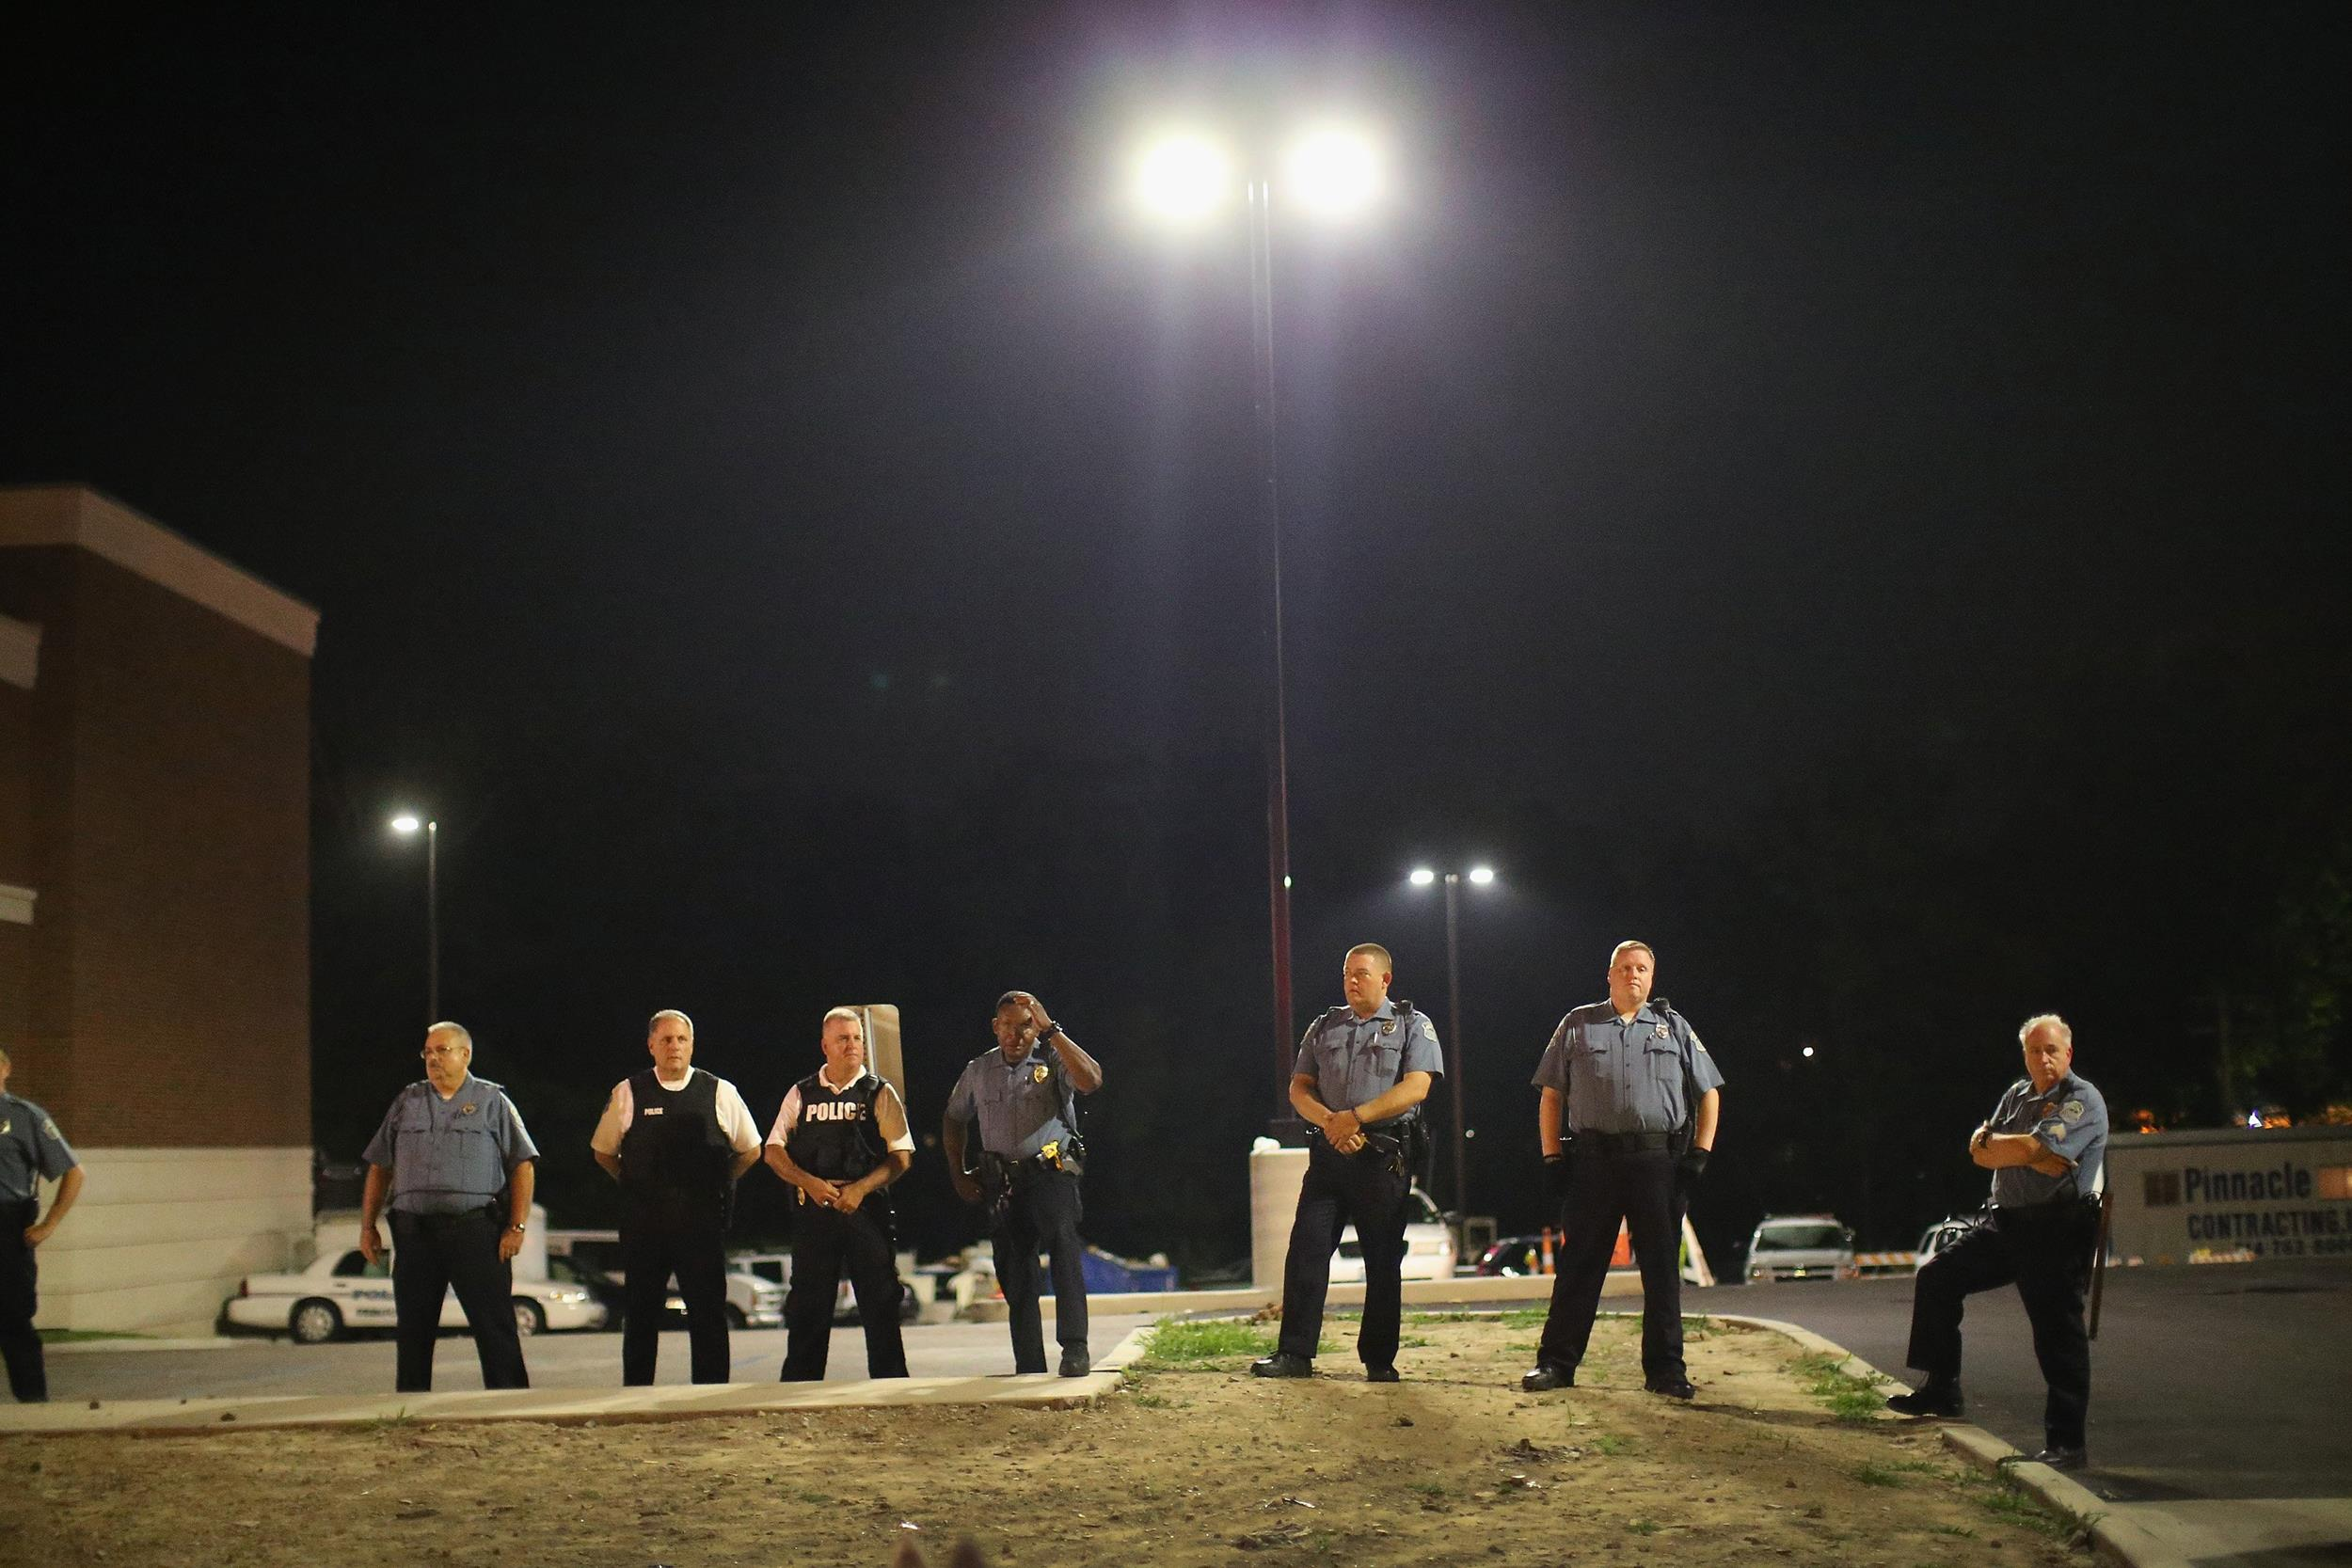 Image: Ferguson police